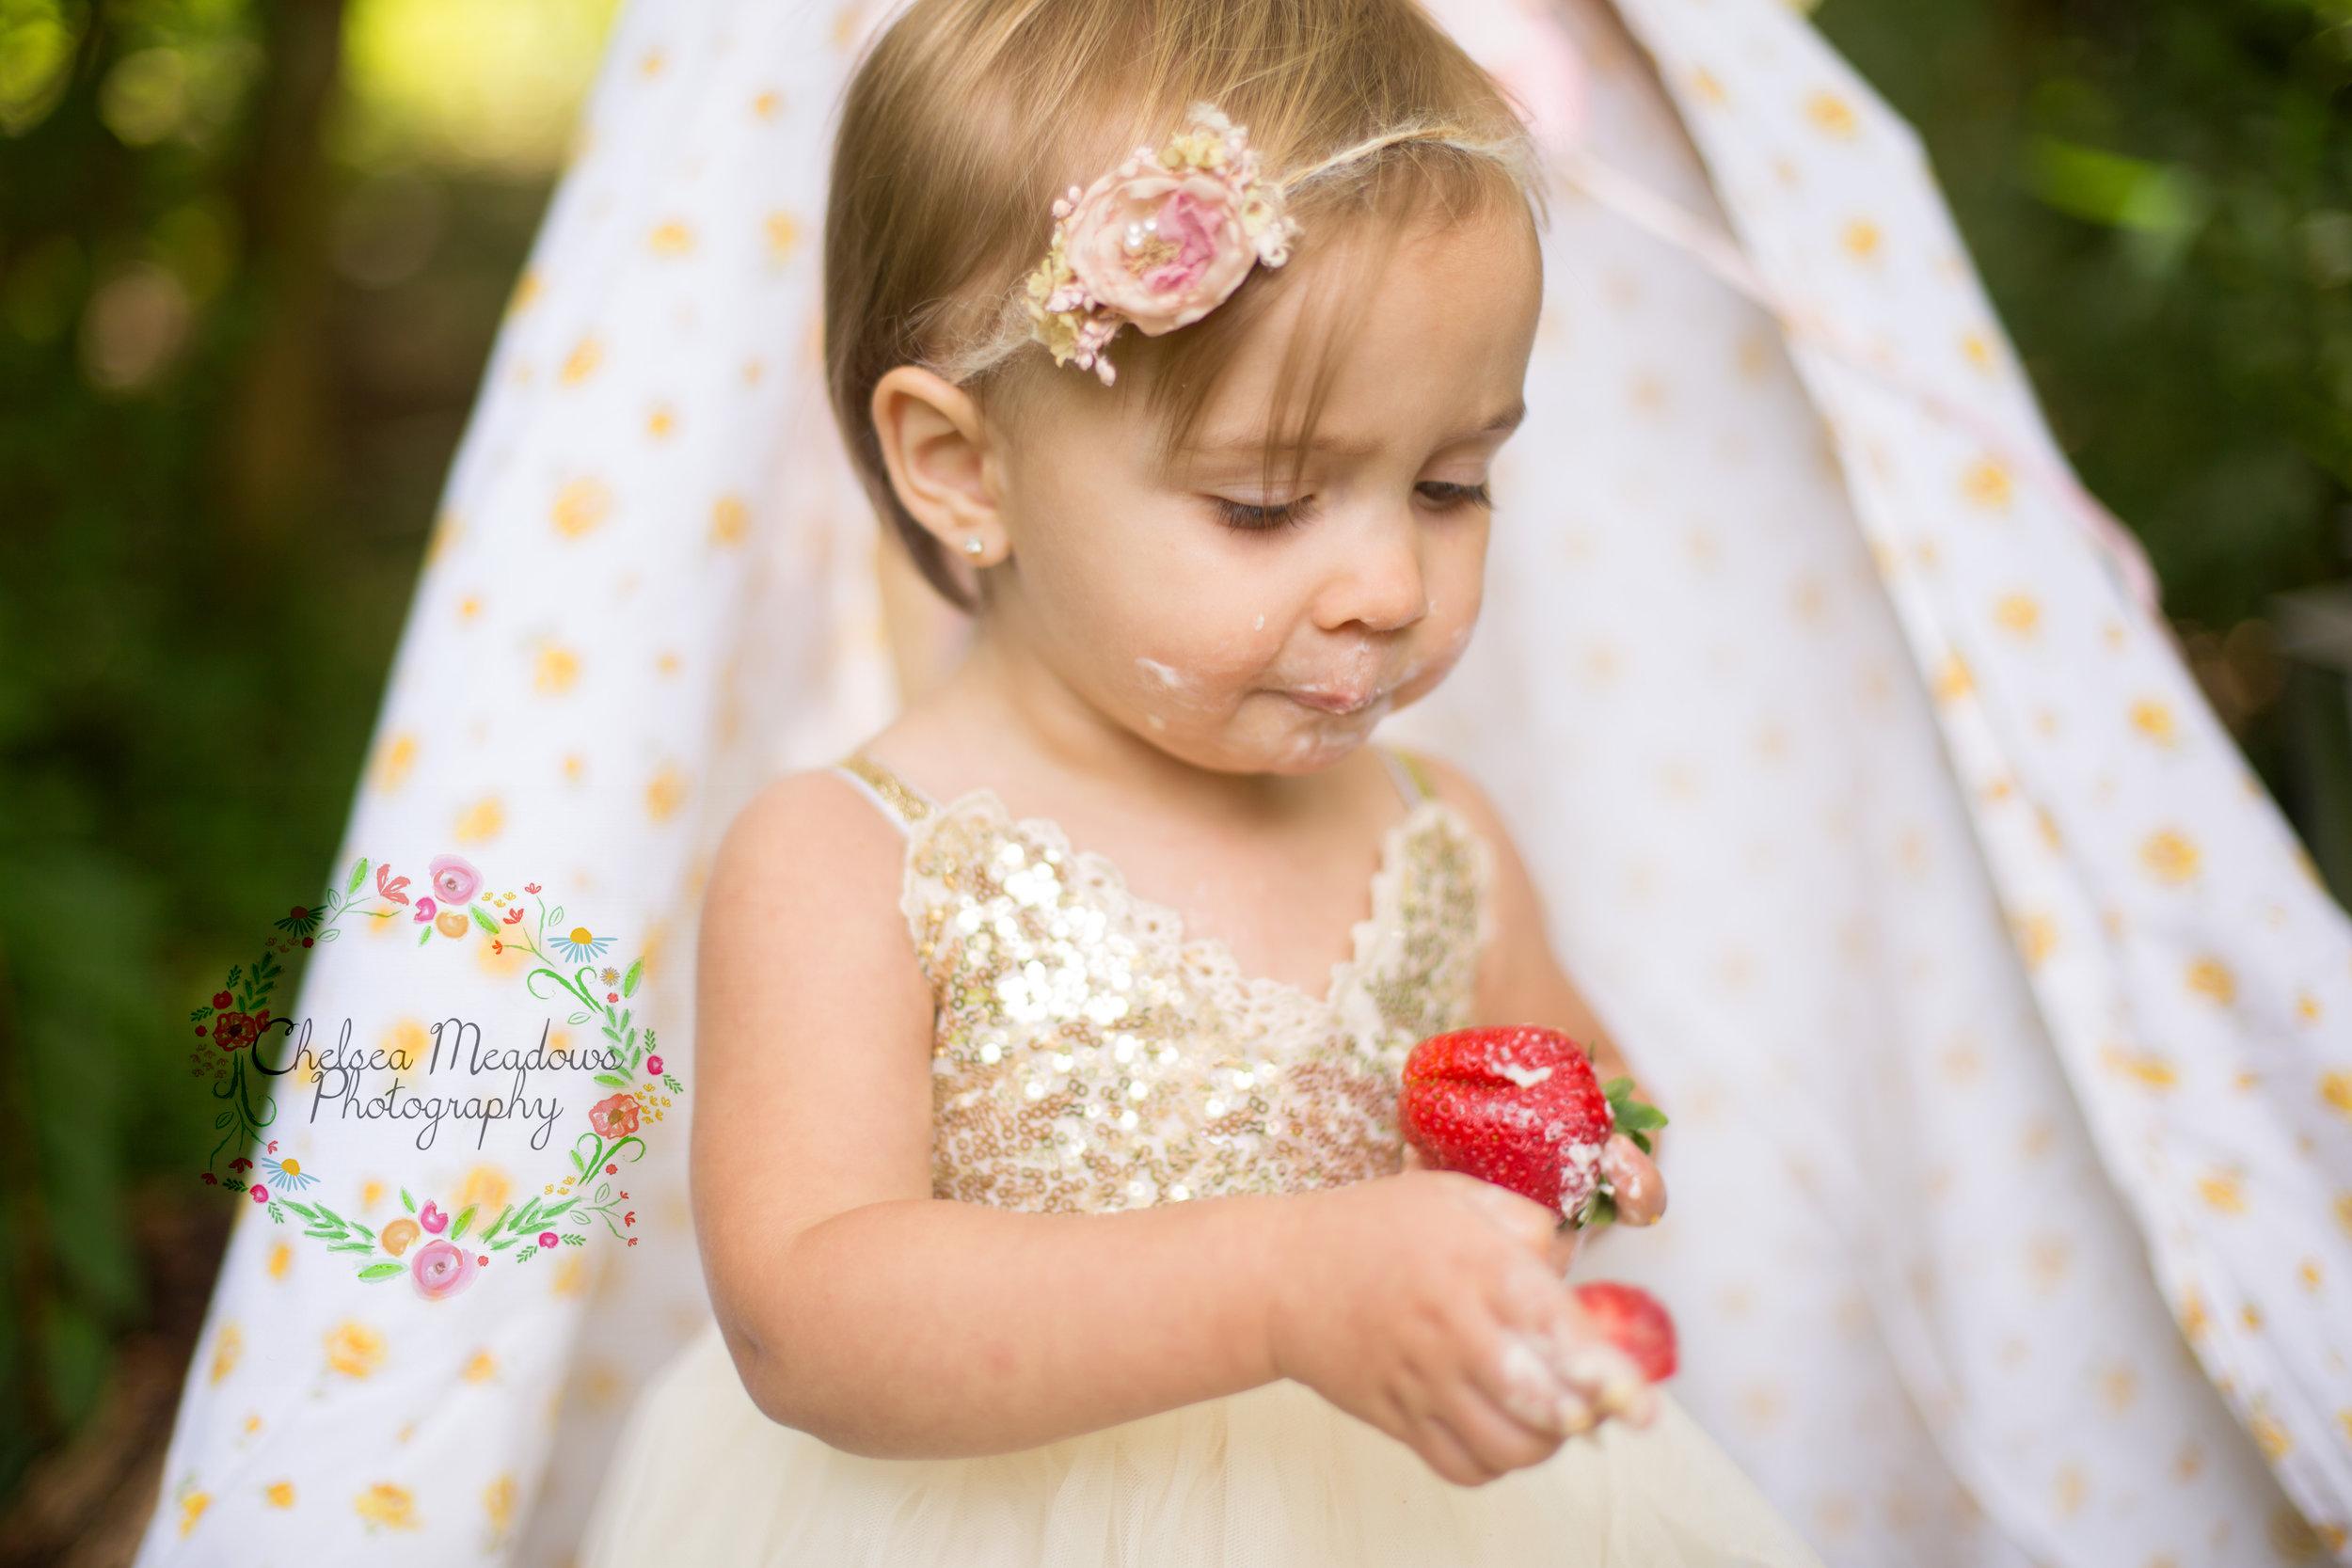 Paisley First Birthay Cake Smash - Nashville Family Photographer - Chelsea Meadows Photography (25).jpg